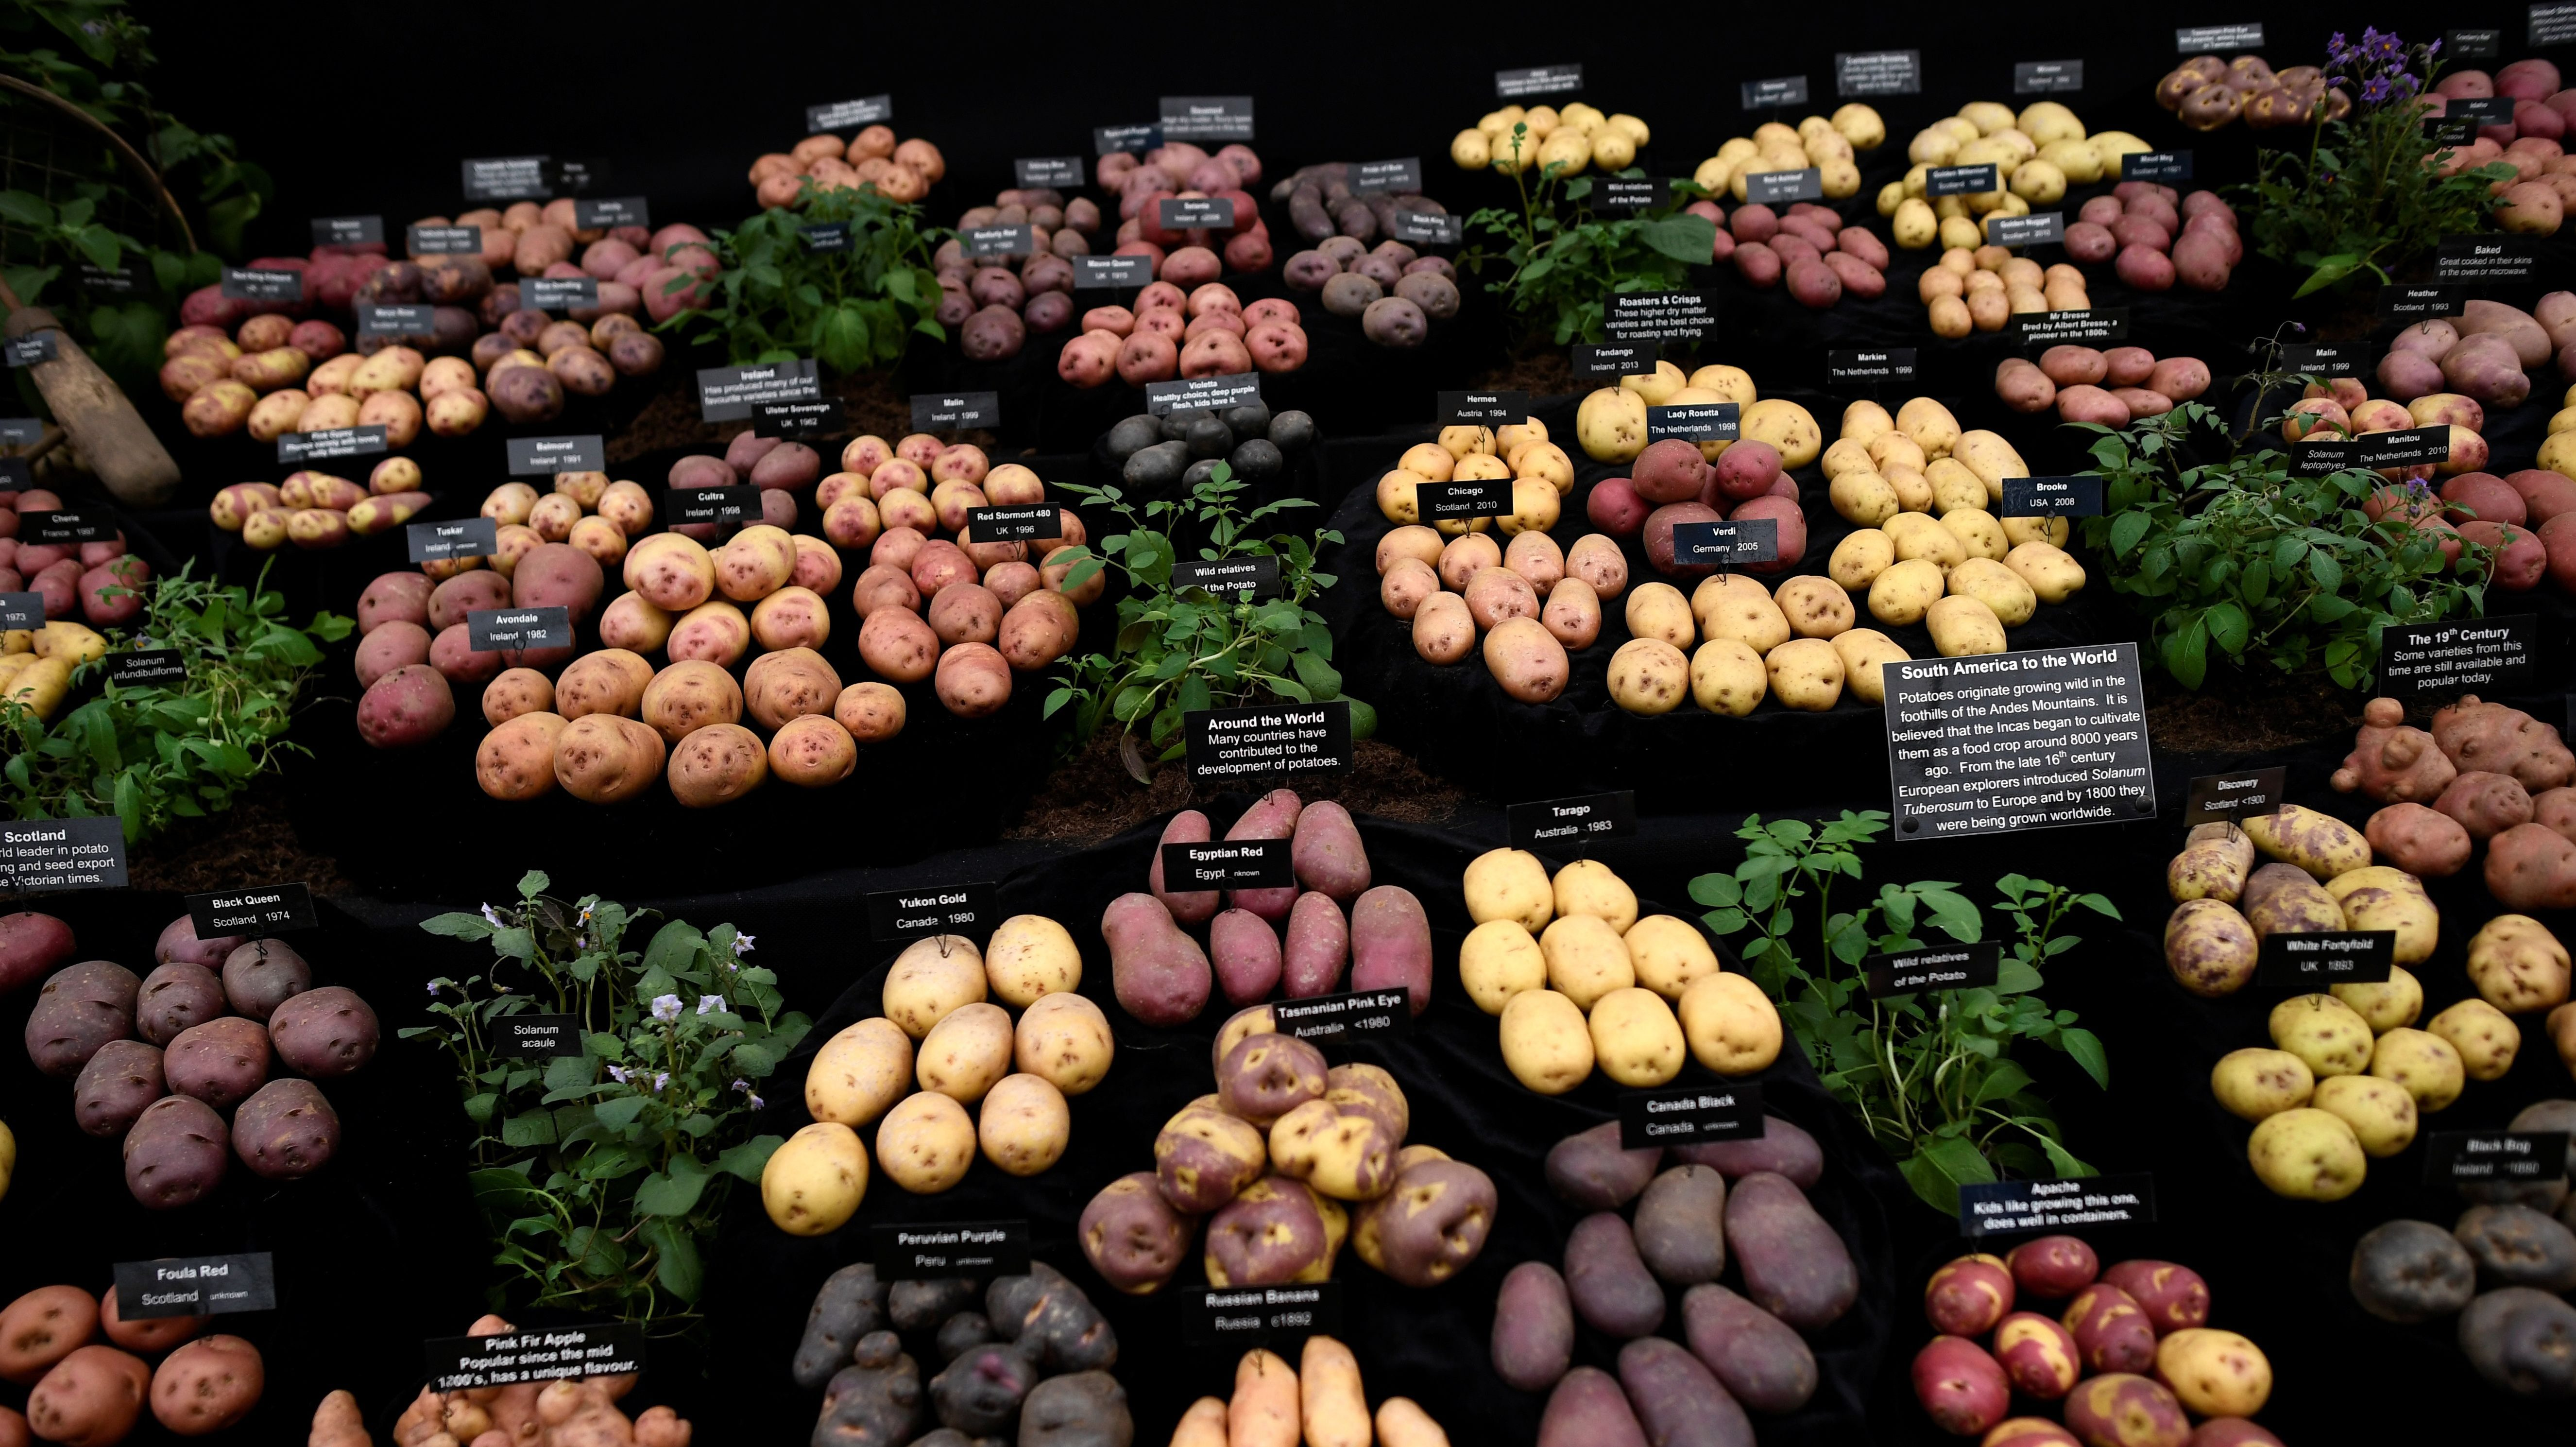 The delicious, nutritious potato gets a bad rap